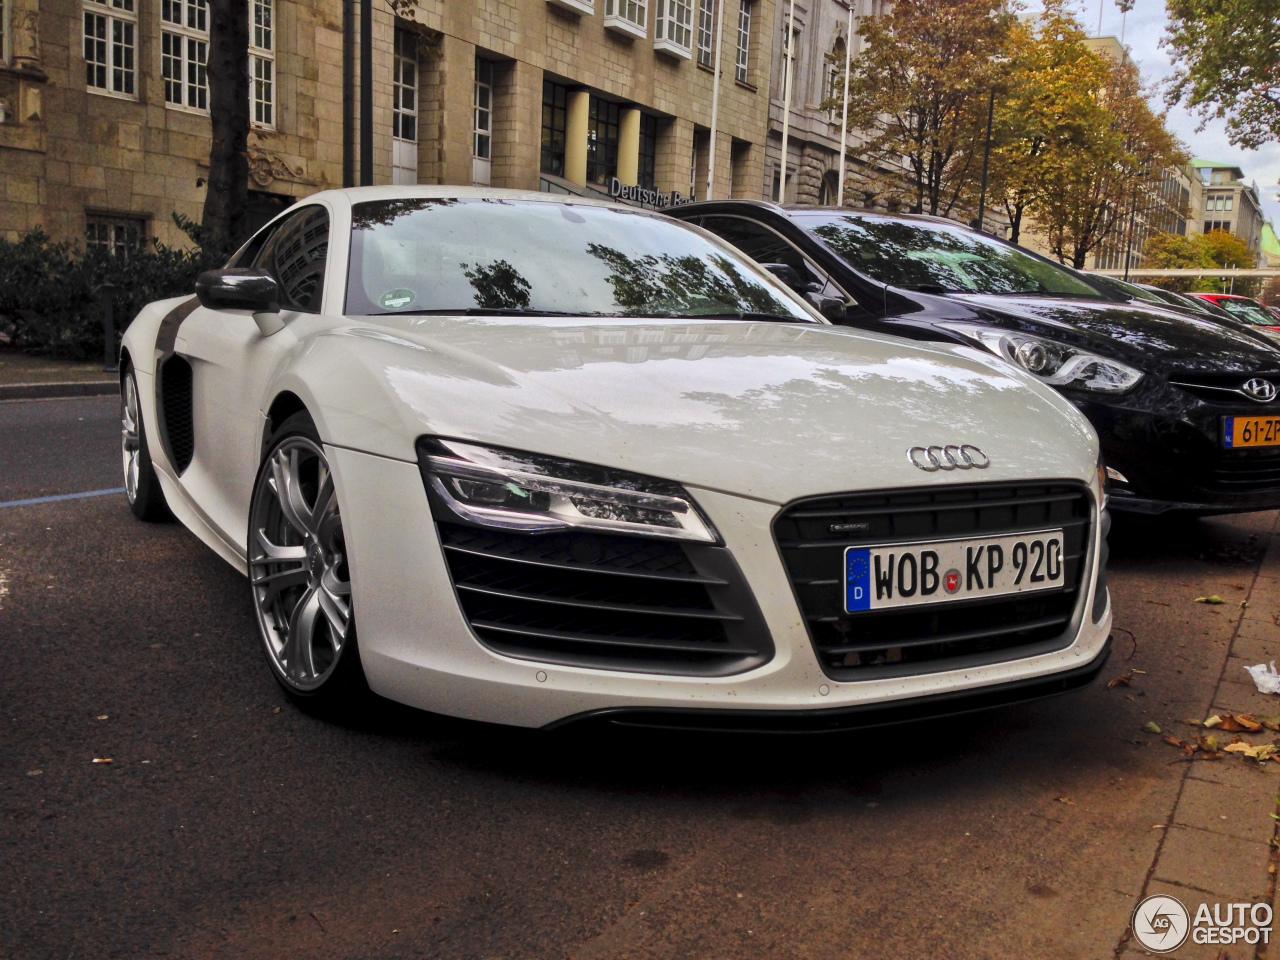 Audi R8 V10 Plus 2013 21 October 2013 Autogespot